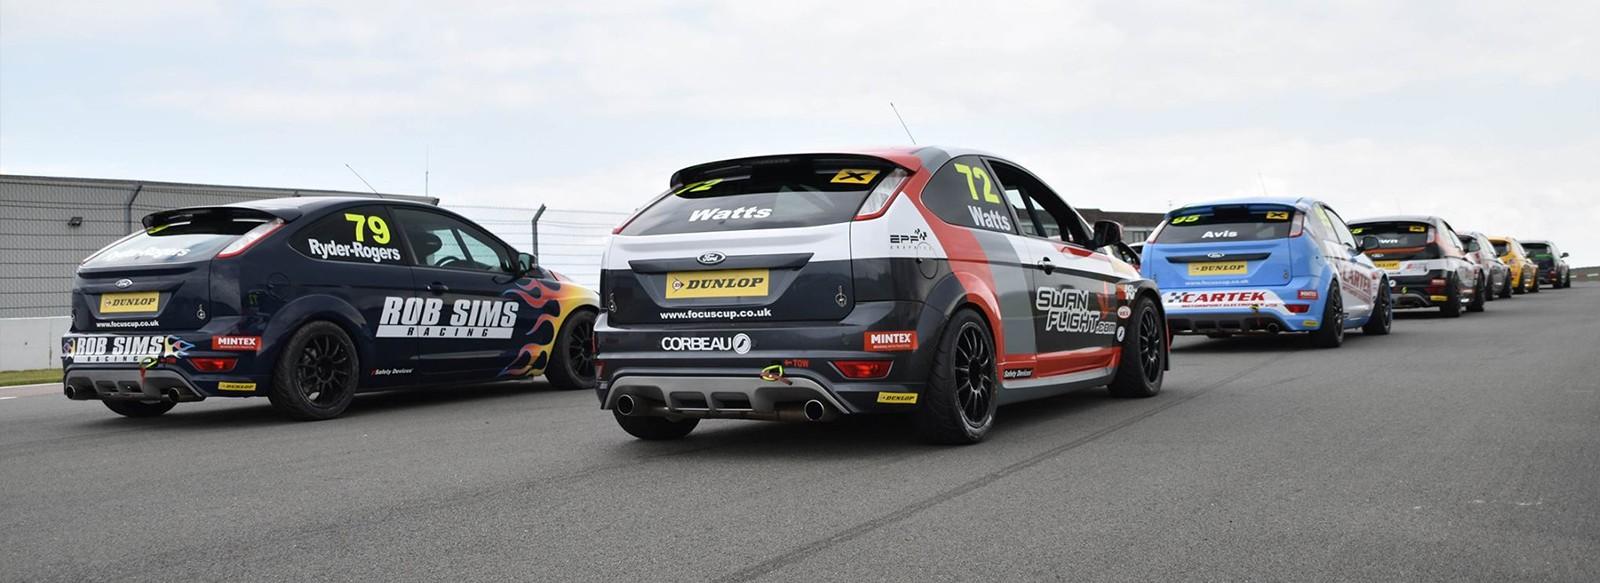 Focus Cup Car Banner